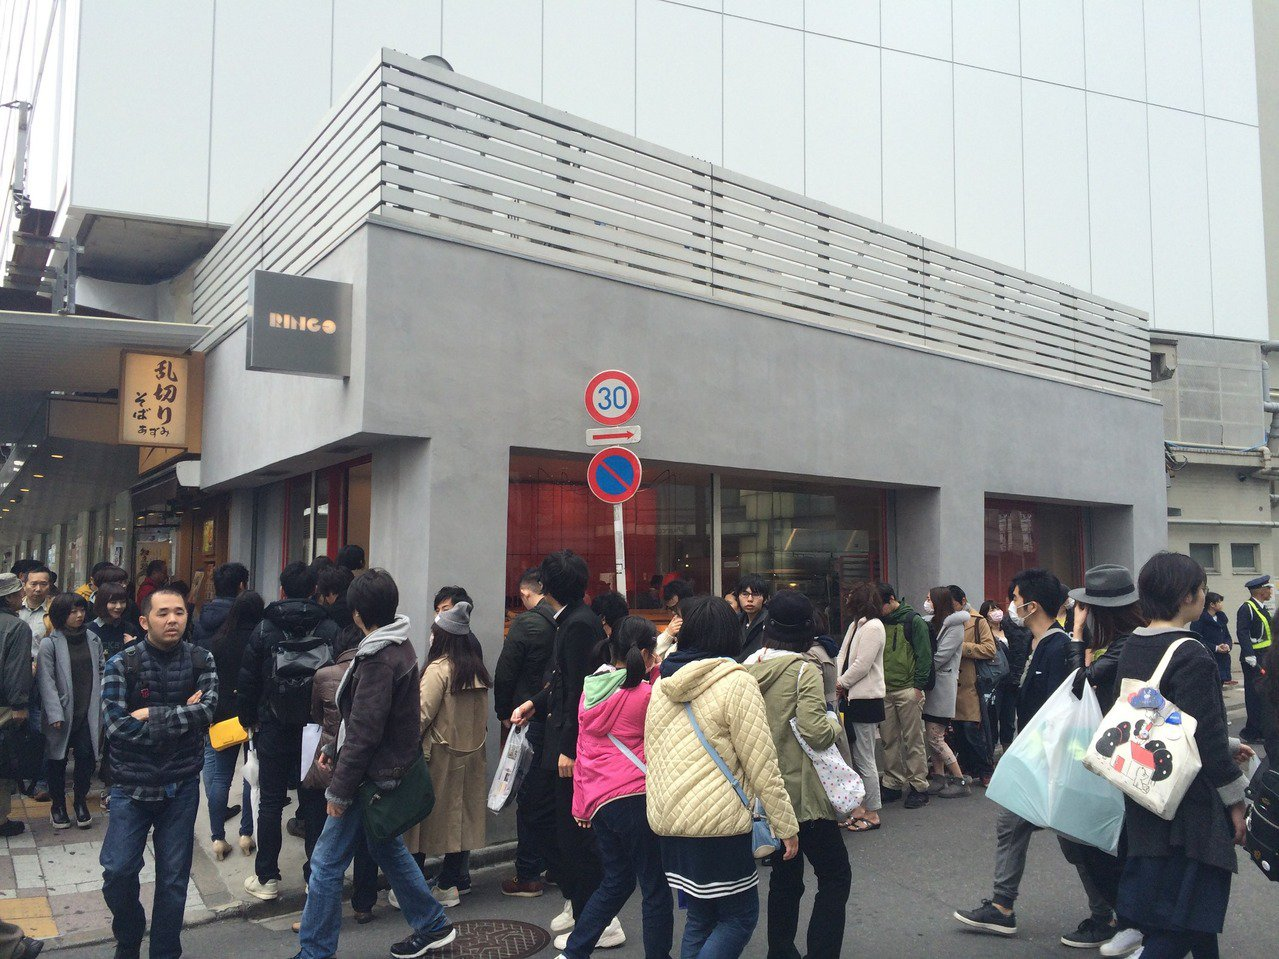 RAPL澎派令果去年在日本開幕時曾引起排隊人潮。圖/RAPL提供